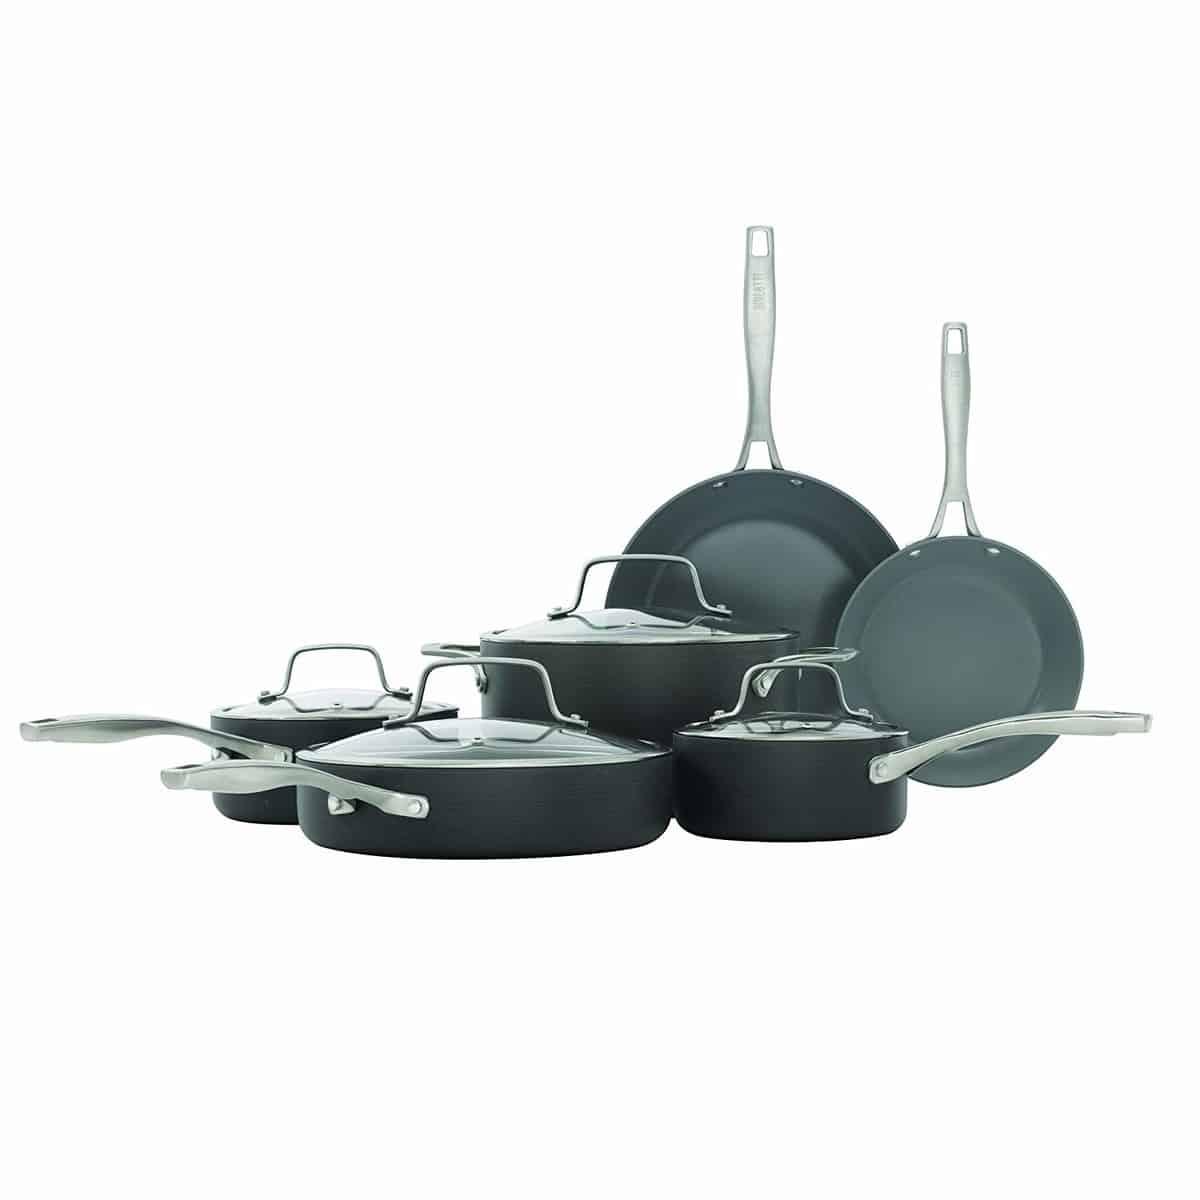 Bialetti 10 Piece Ceramic Pro Hard Anodized Nonstick Cookware Set, Gray